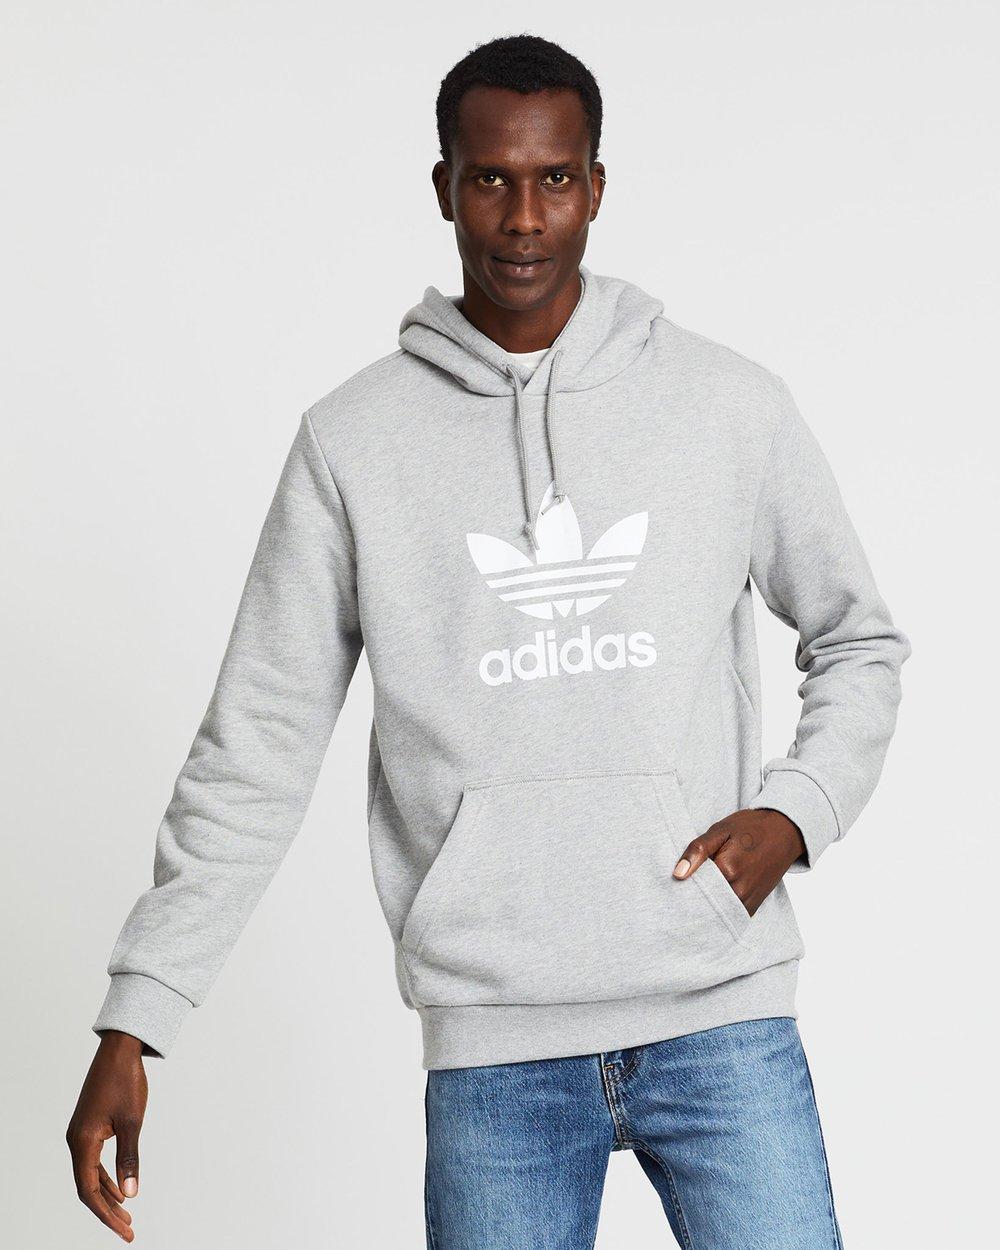 550a32727f62 Trefoil Hoodie by adidas Originals Online